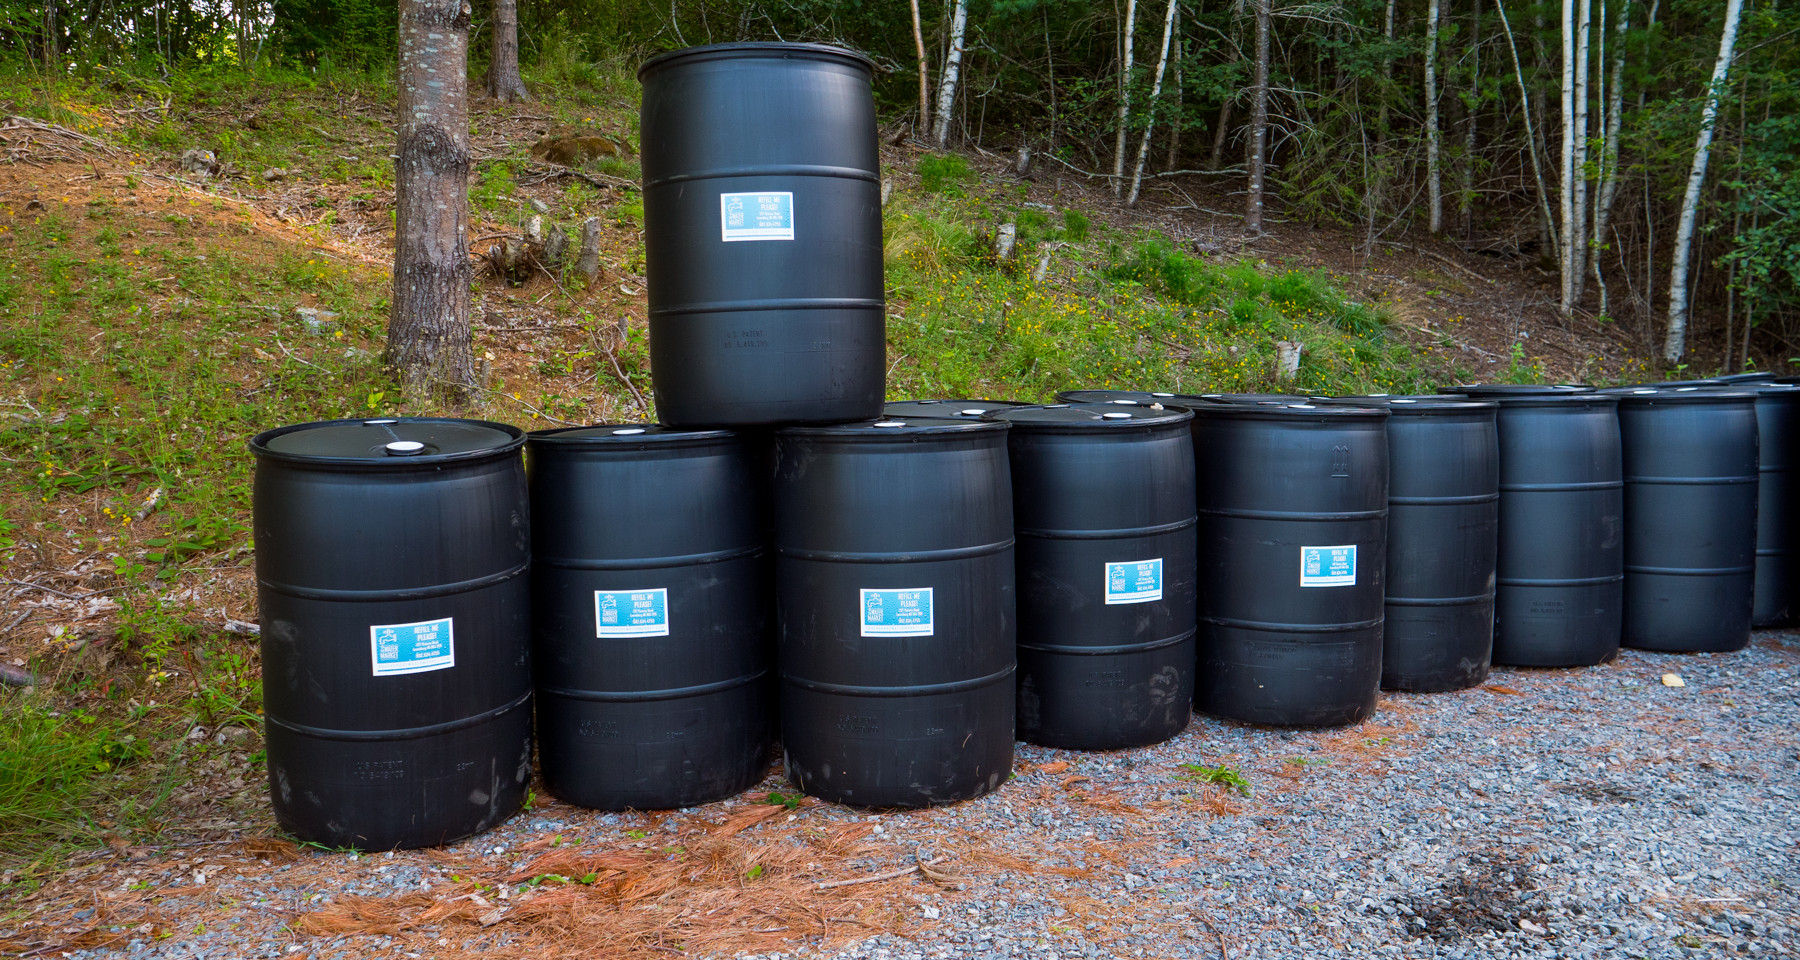 twm-200901-barrels-9.jpg